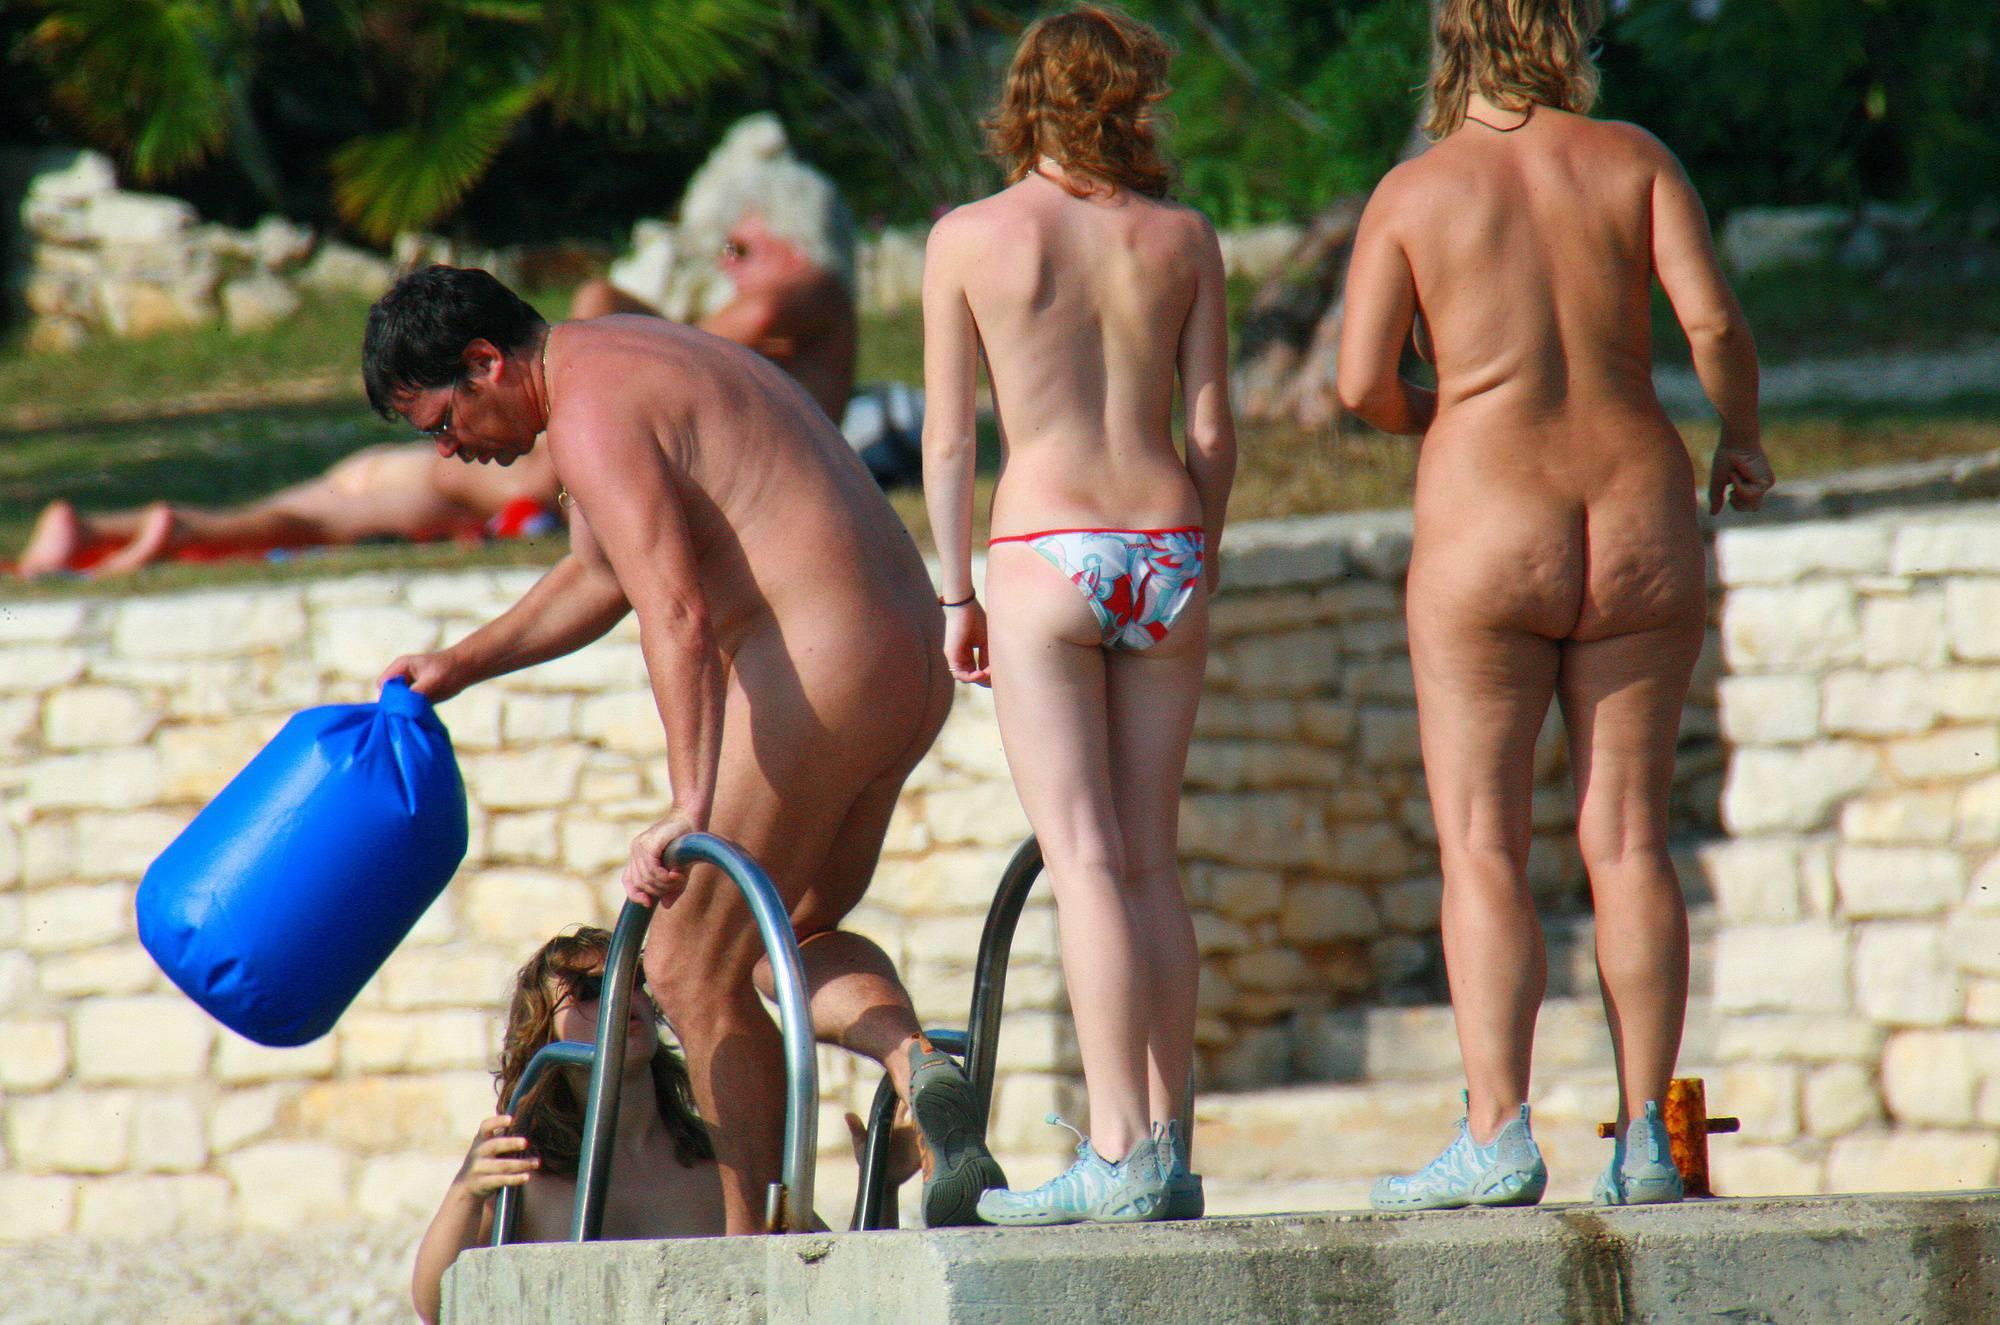 Nudist Gallery Ula FKK Exploration Family - 1